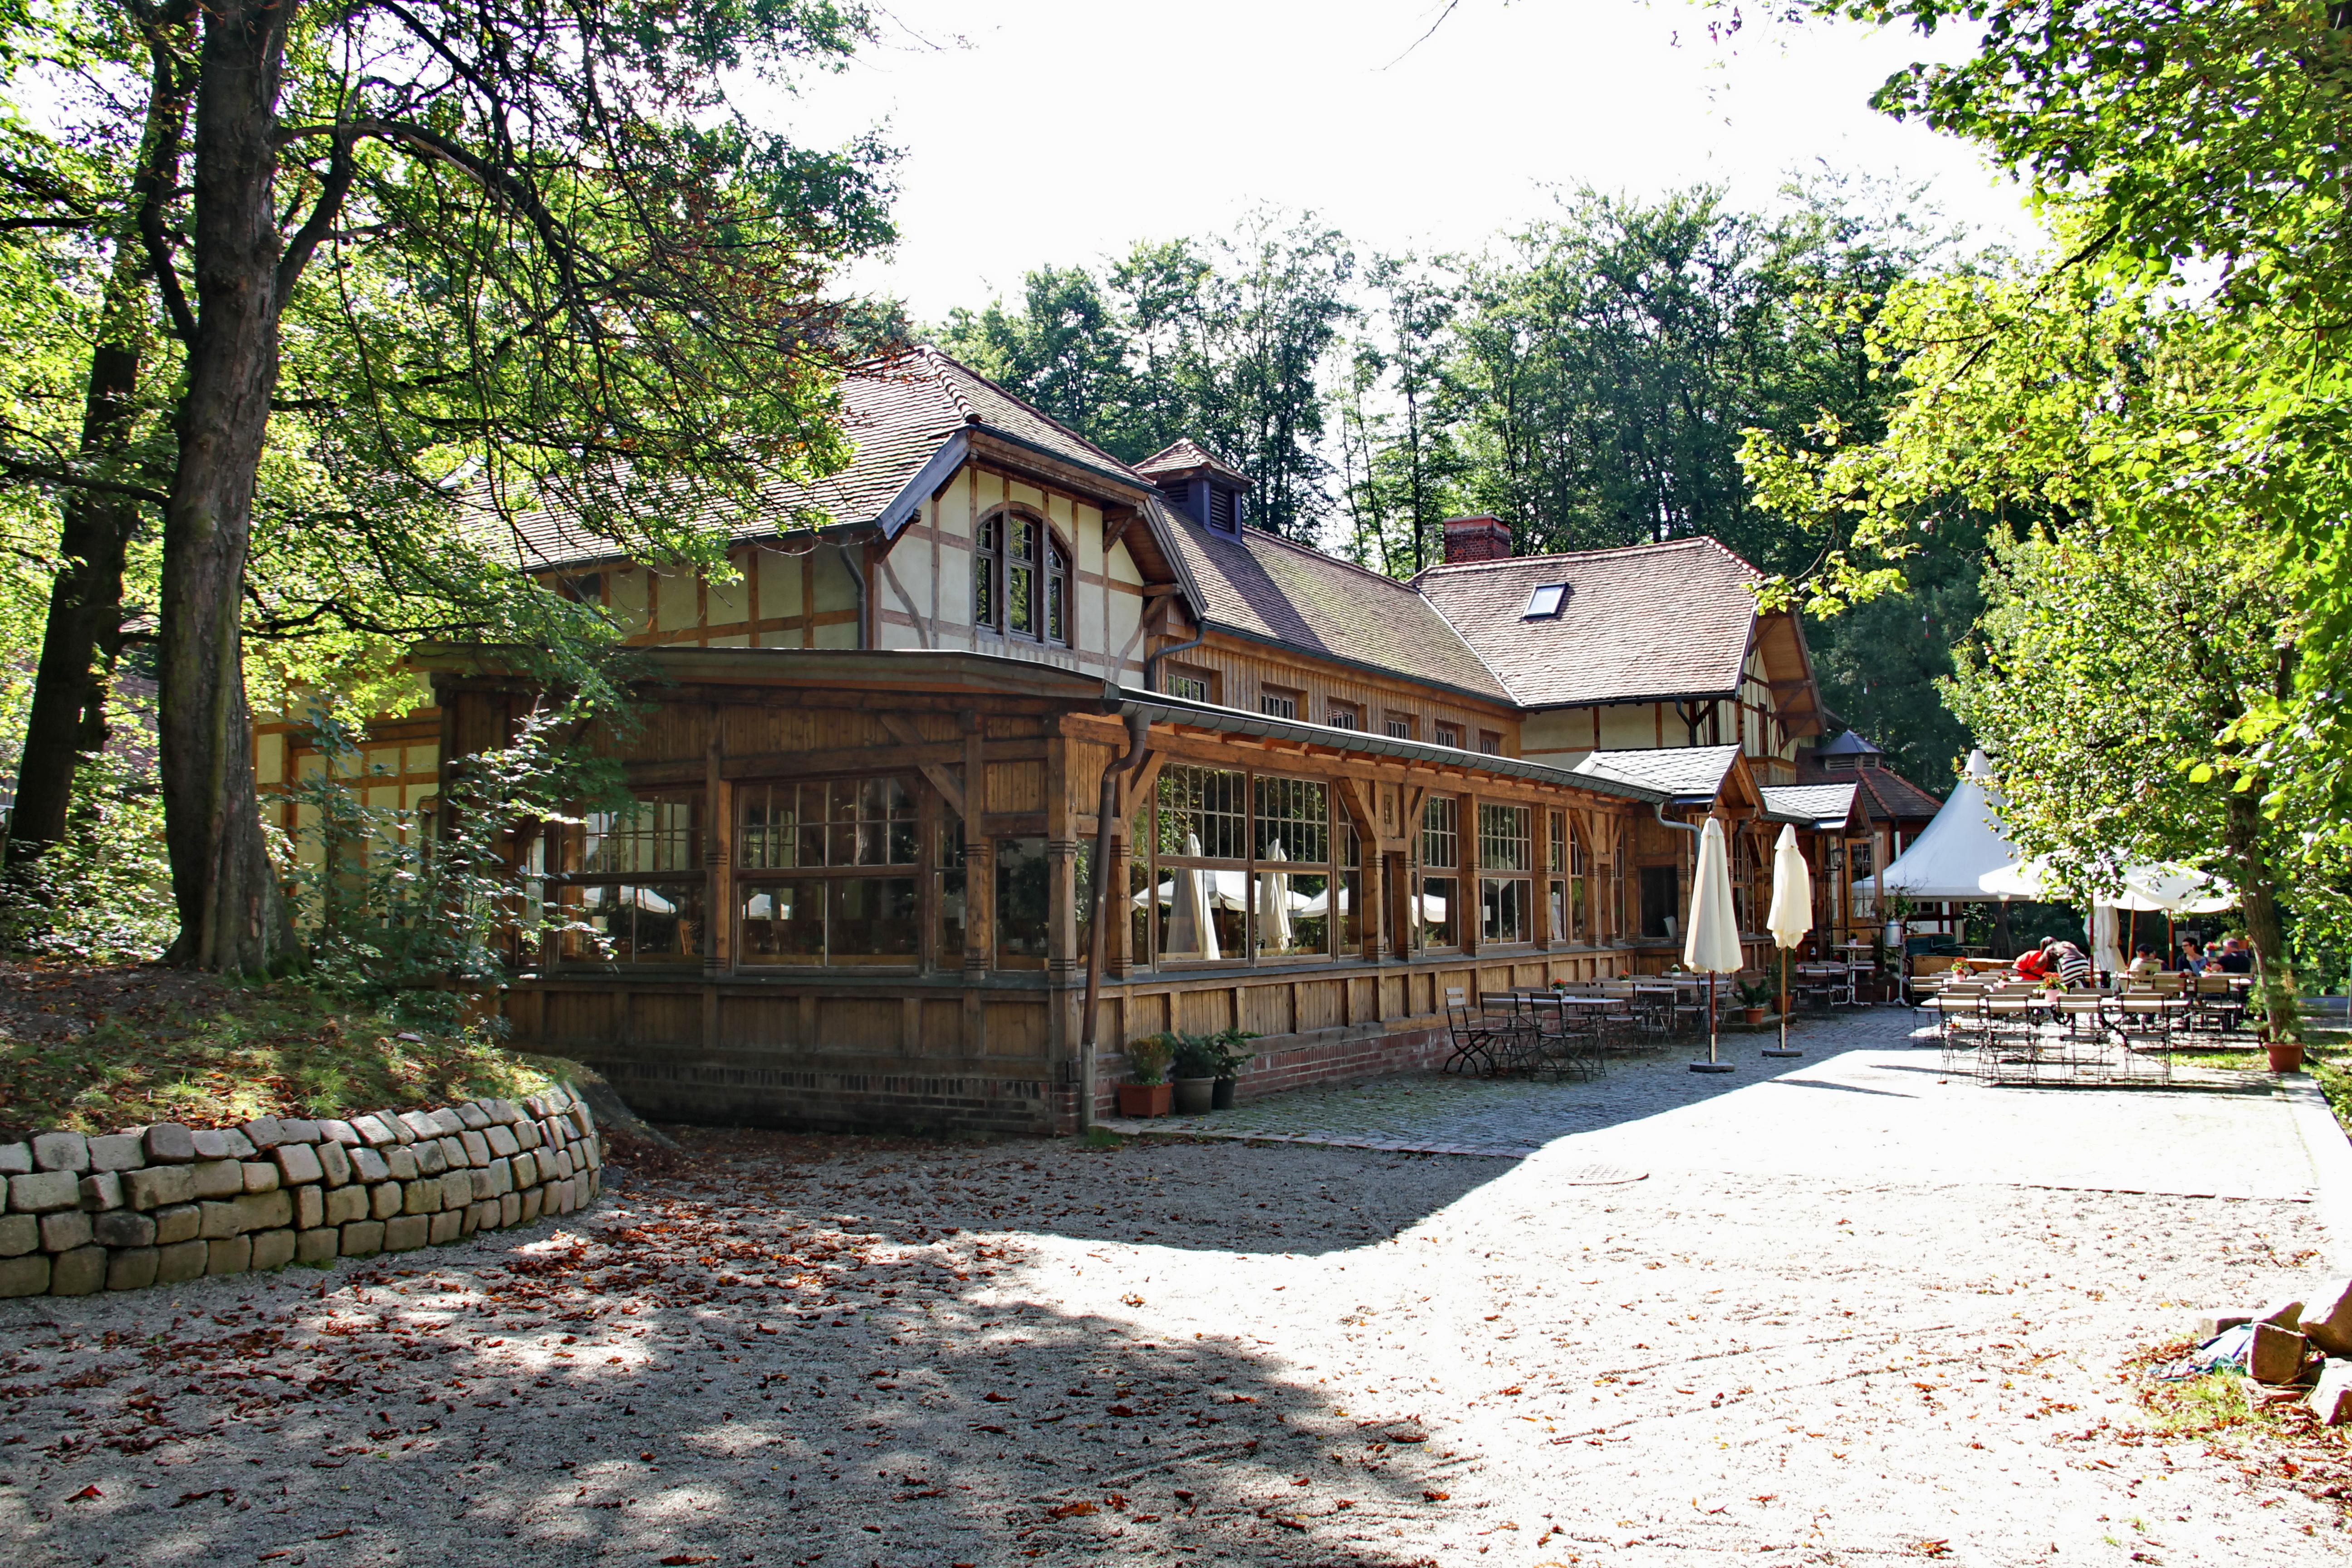 Datei:Zeisigwald Zeisigwaldschänke 4 LvT.JPG – Wikipedia